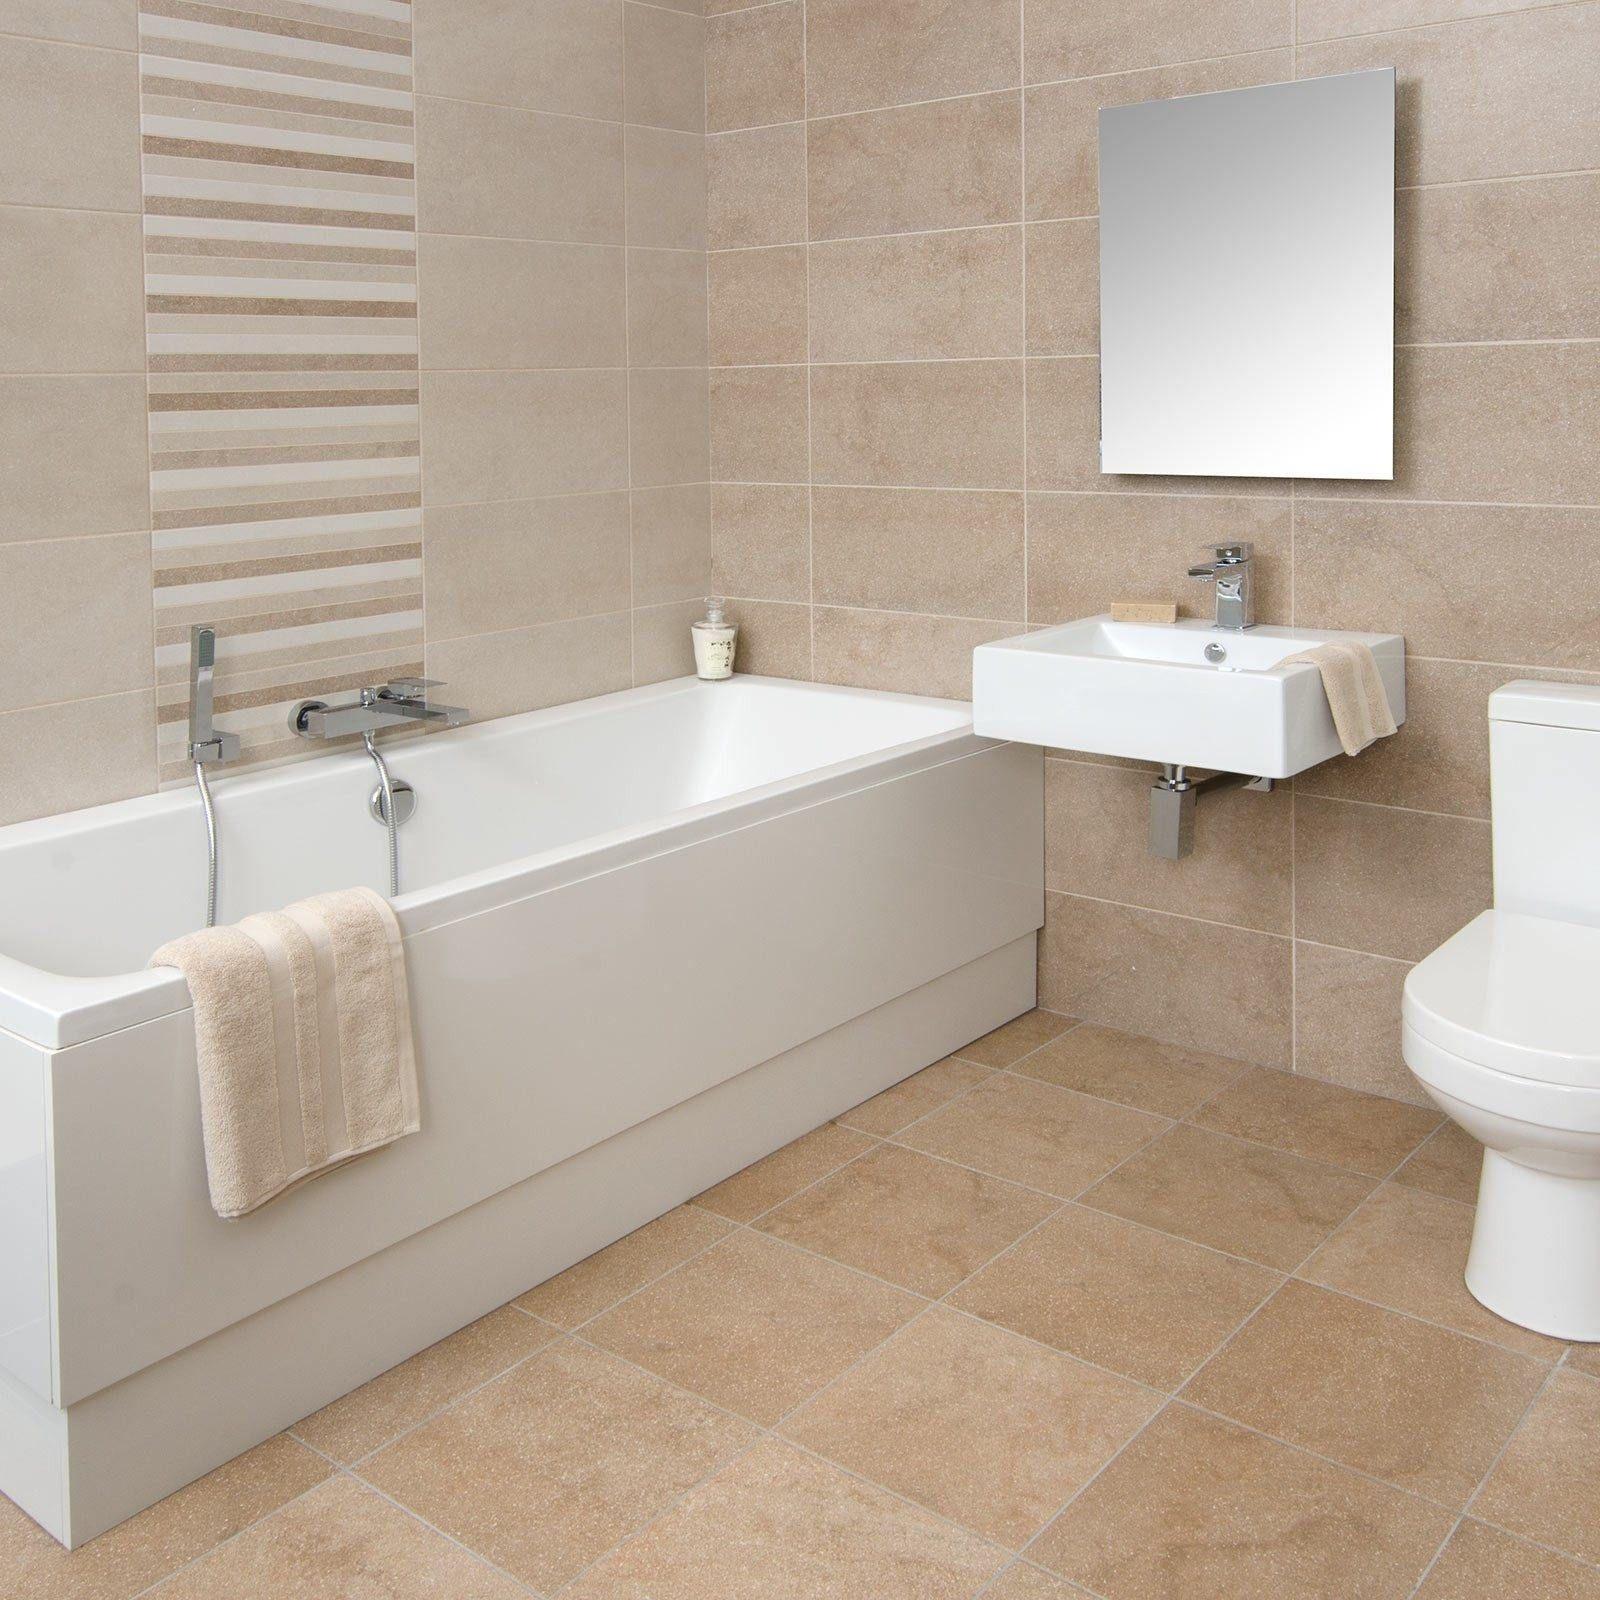 Insanely Beautiful Luxury Bathroom Tile Ideas Beige ...